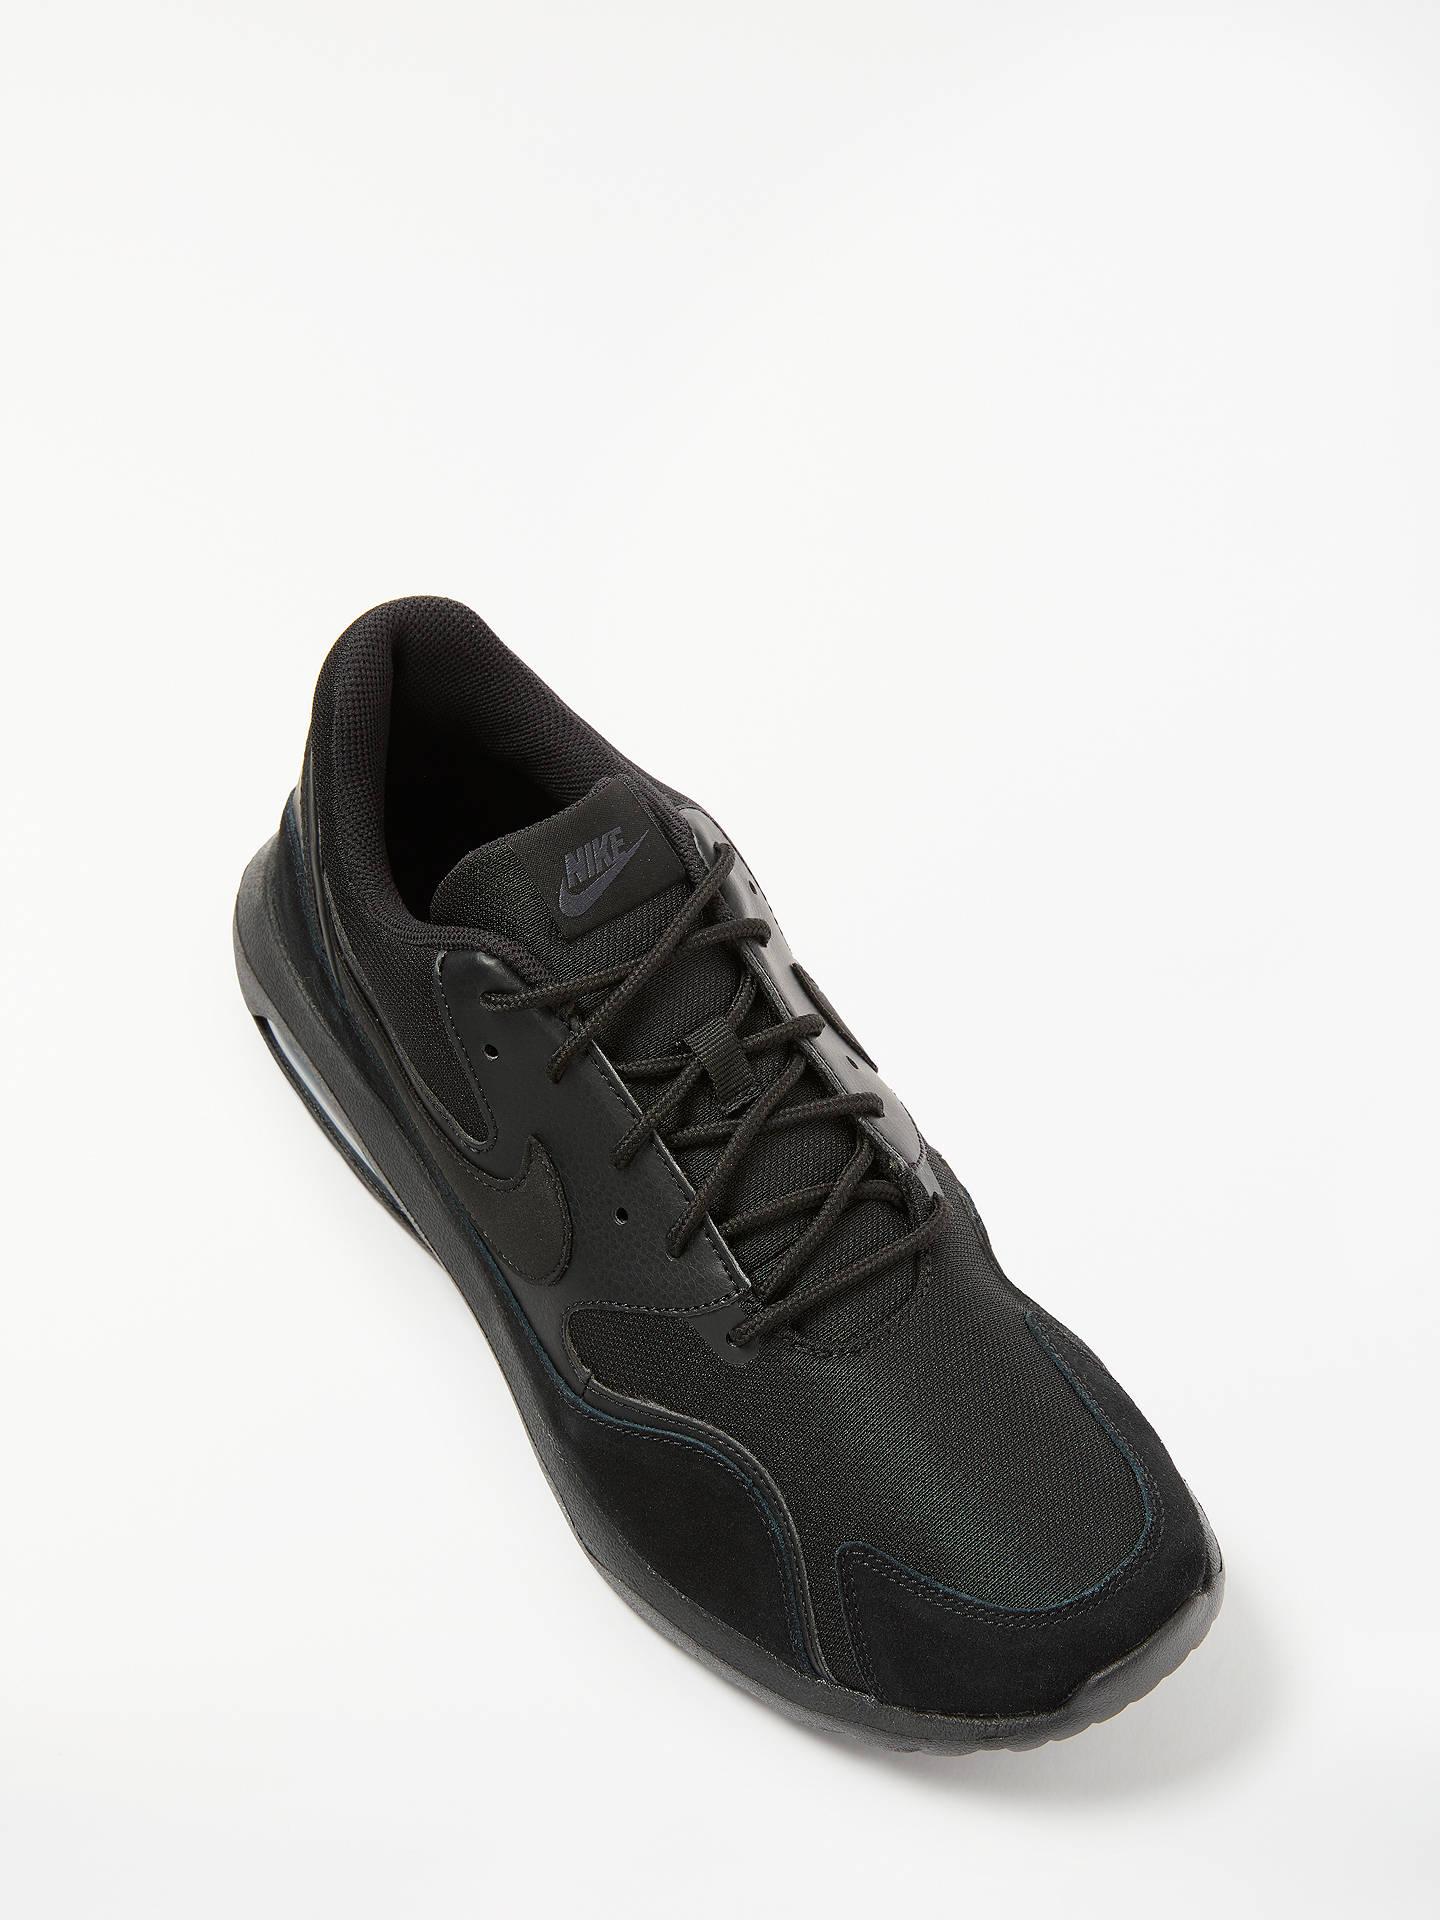 big sale 0e265 91caf ... Buy Nike Air Max Nostalgic Men s Trainers, Black, 7 Online at johnlewis.  ...